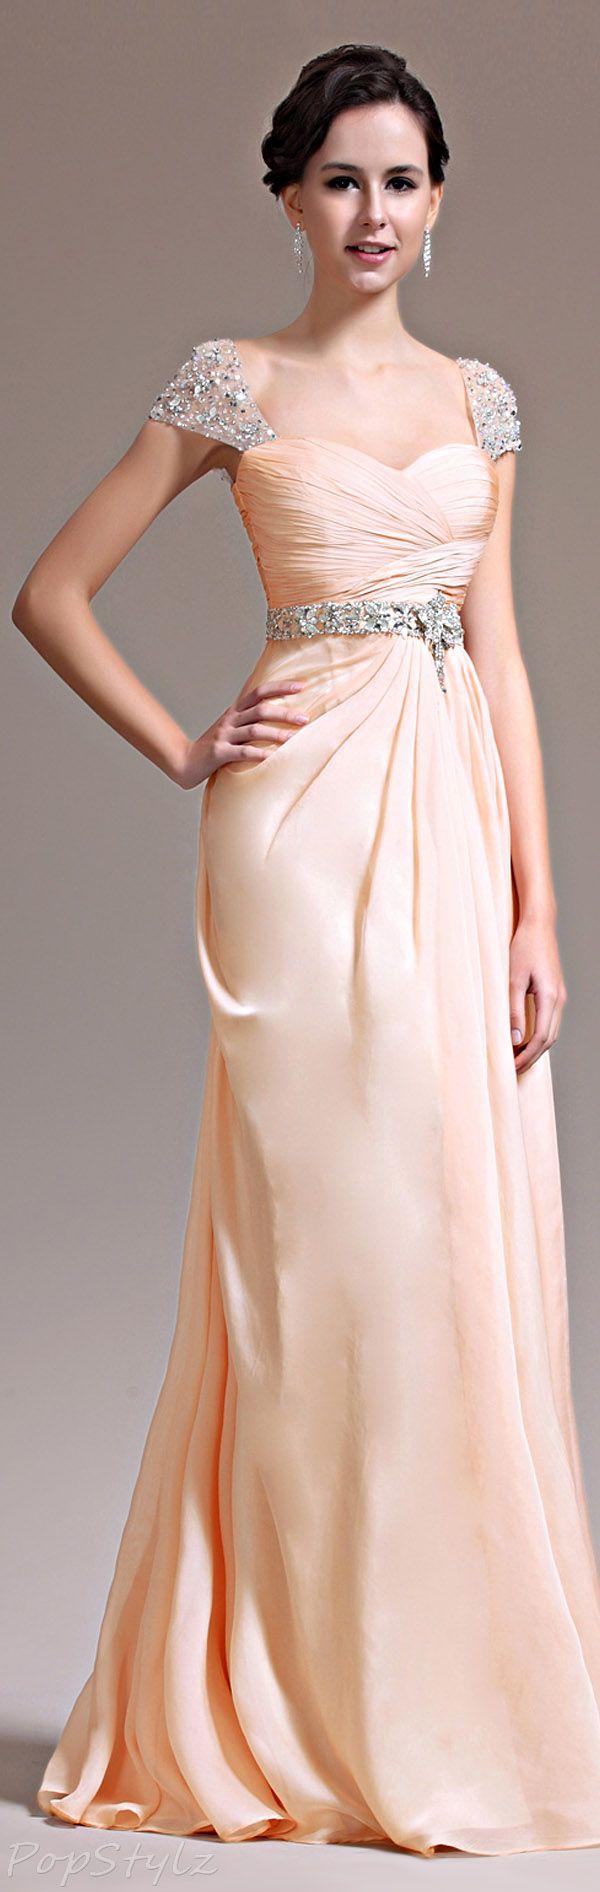 eDressit 00137214 Evening Gown